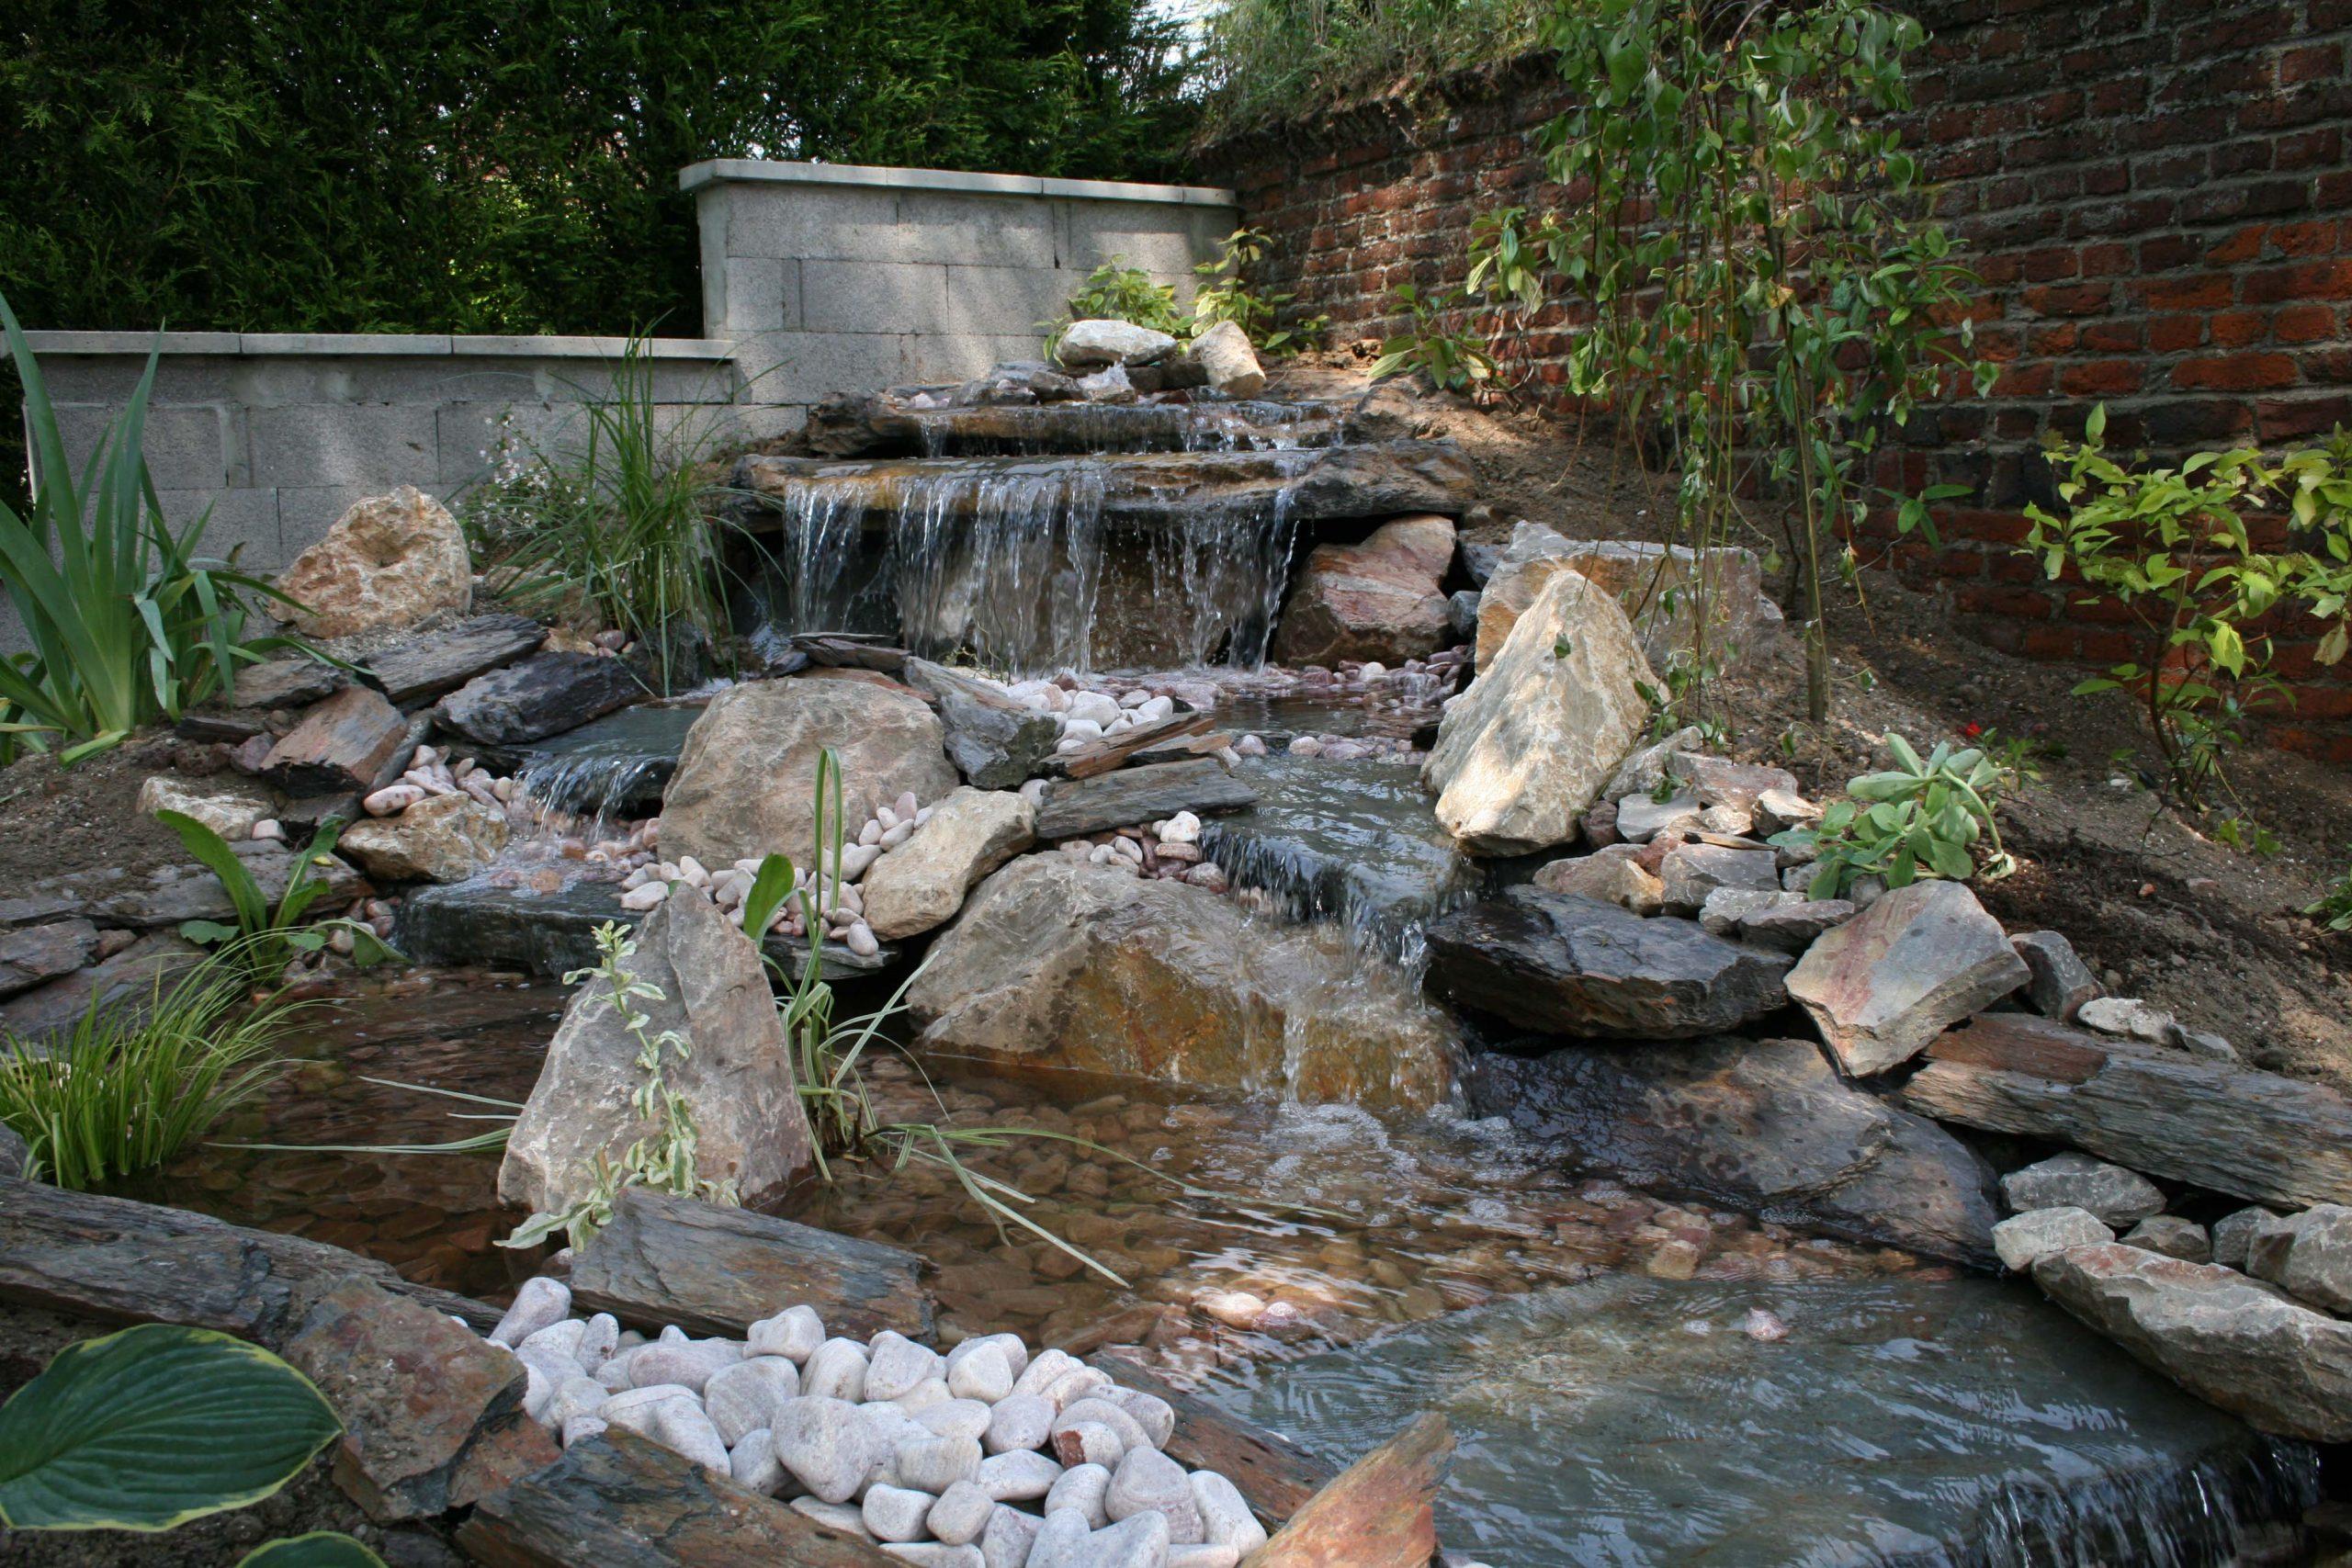 Cuisine: Ment Construire Sa Cascade Expert Bassin Cascade ... intérieur Bassin De Jardin Préformé